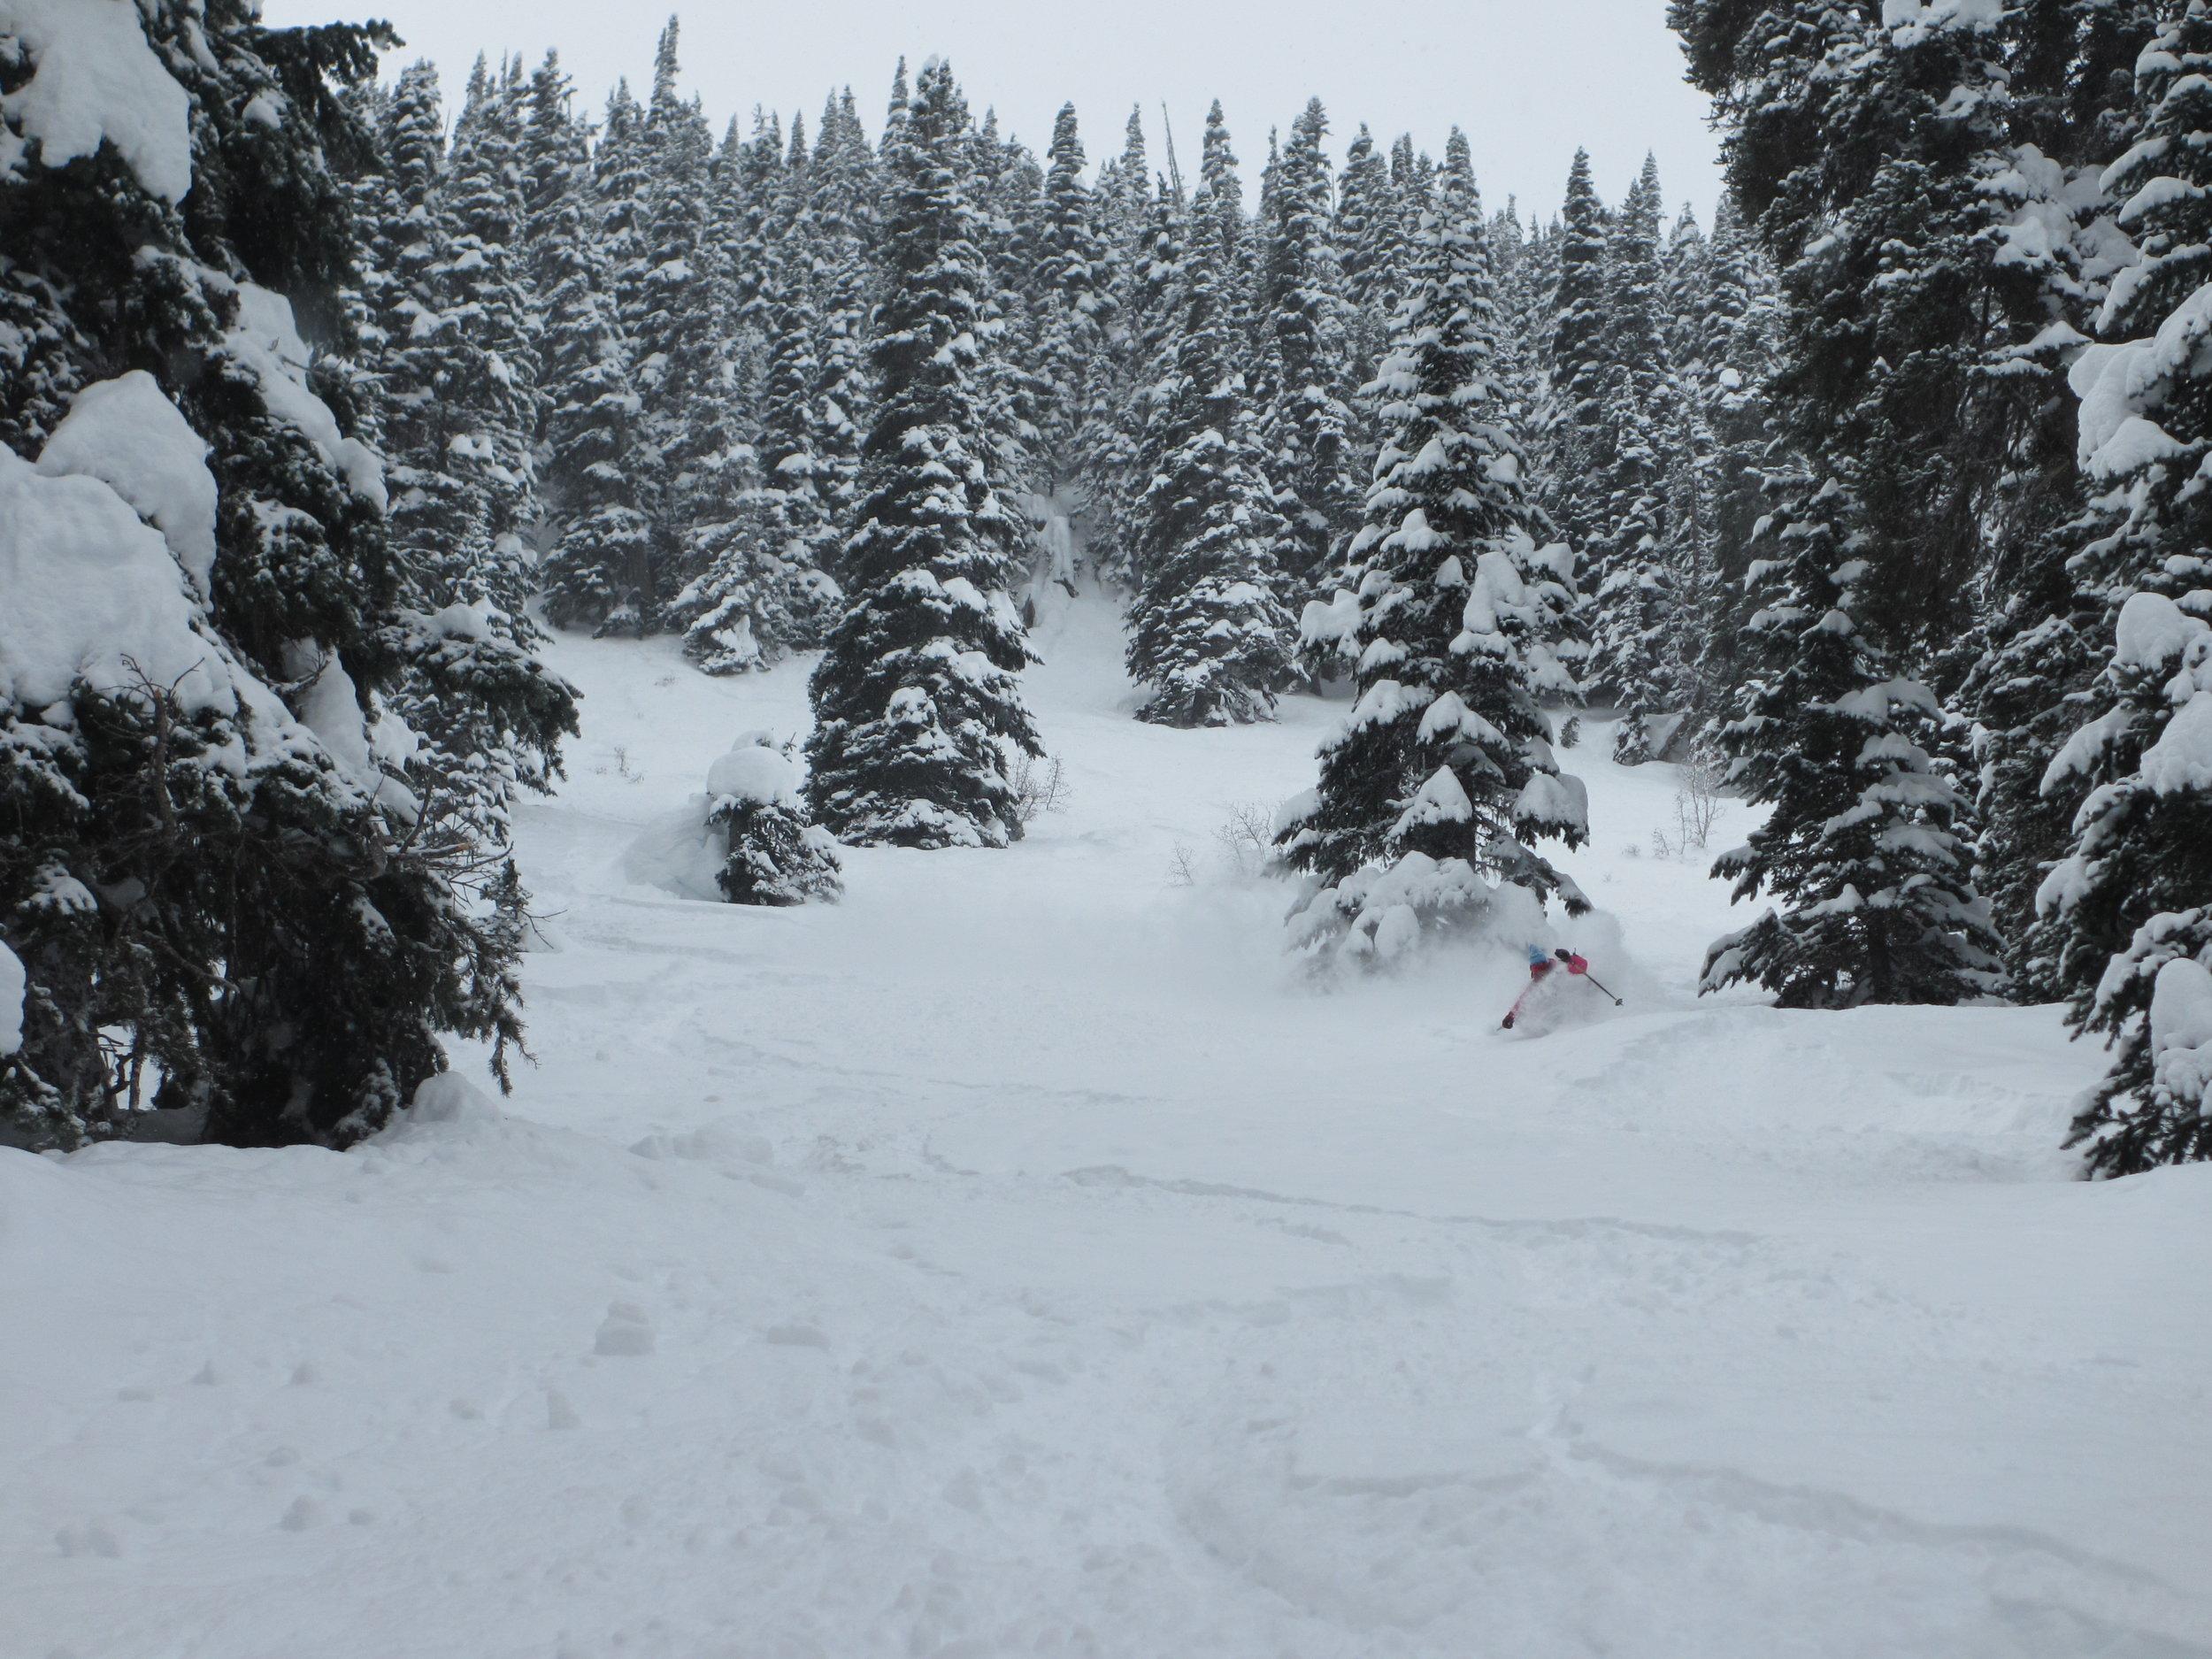 Plenty of great tree skiing right near the hut. Erme getting deep.